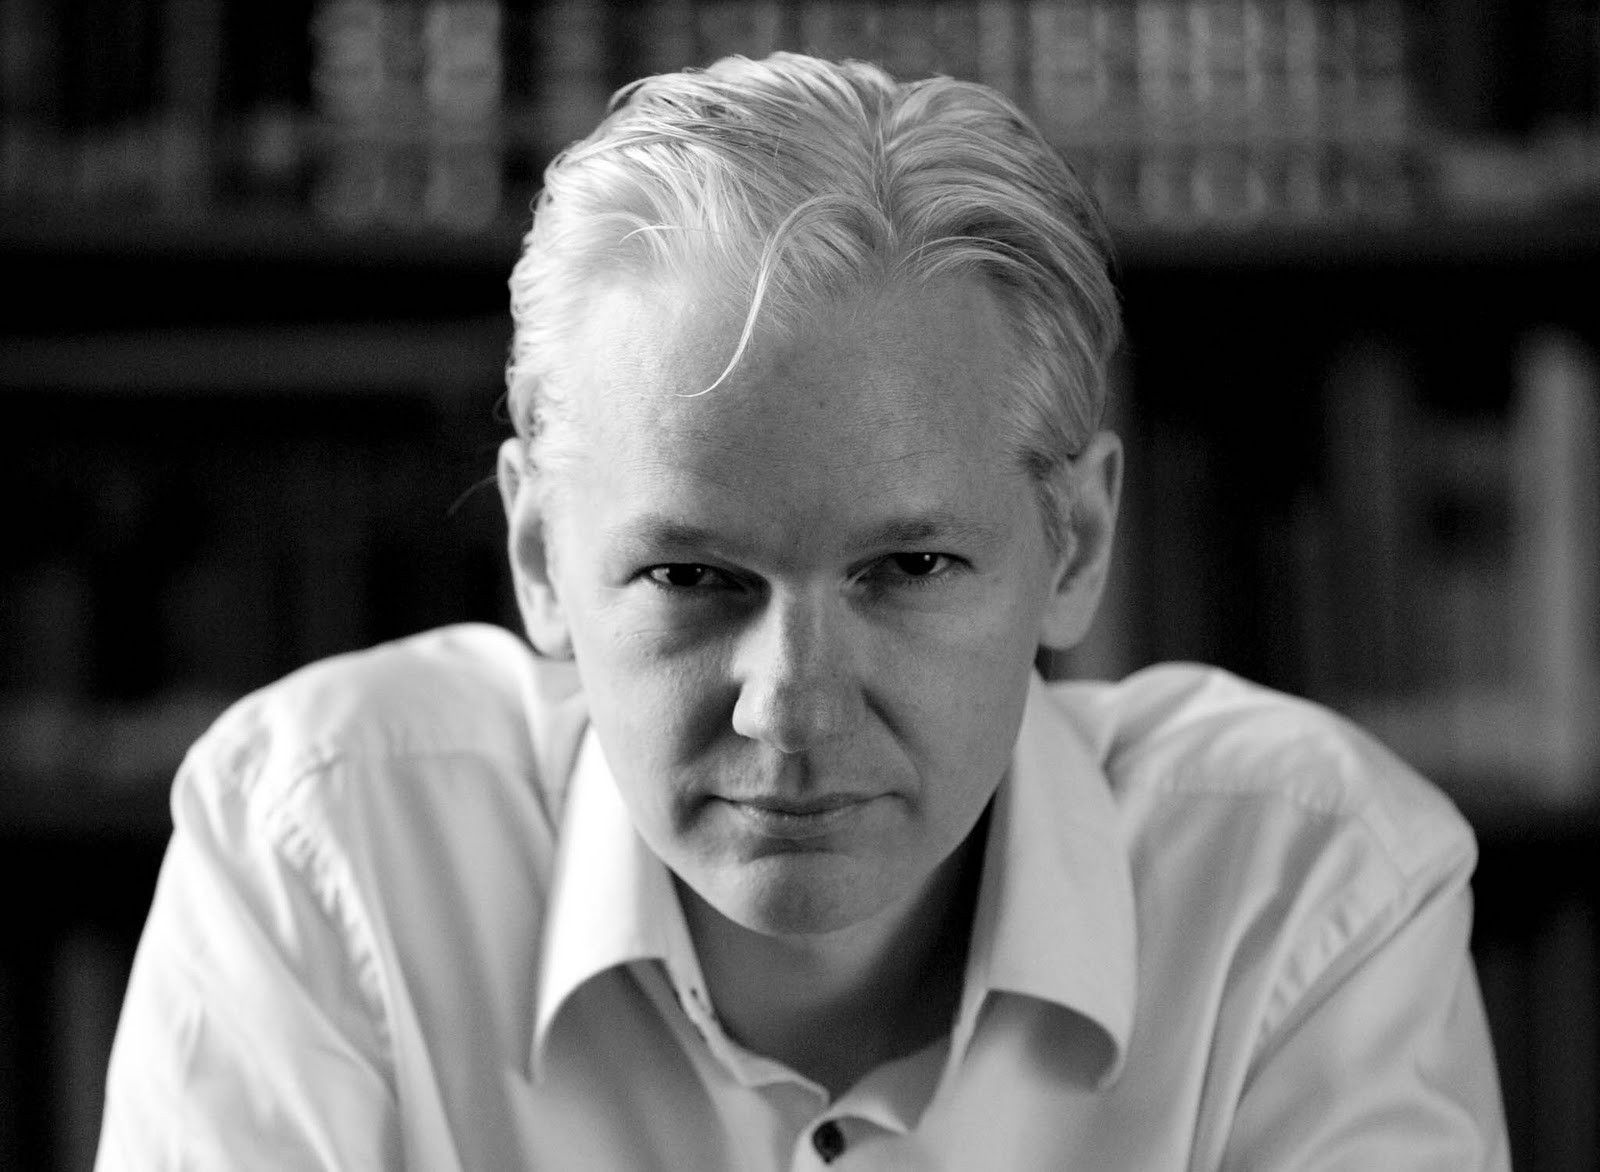 Julian Assange (creador de Wikileaks) ha sido detenido arbitrariamente, según informe de la ONU